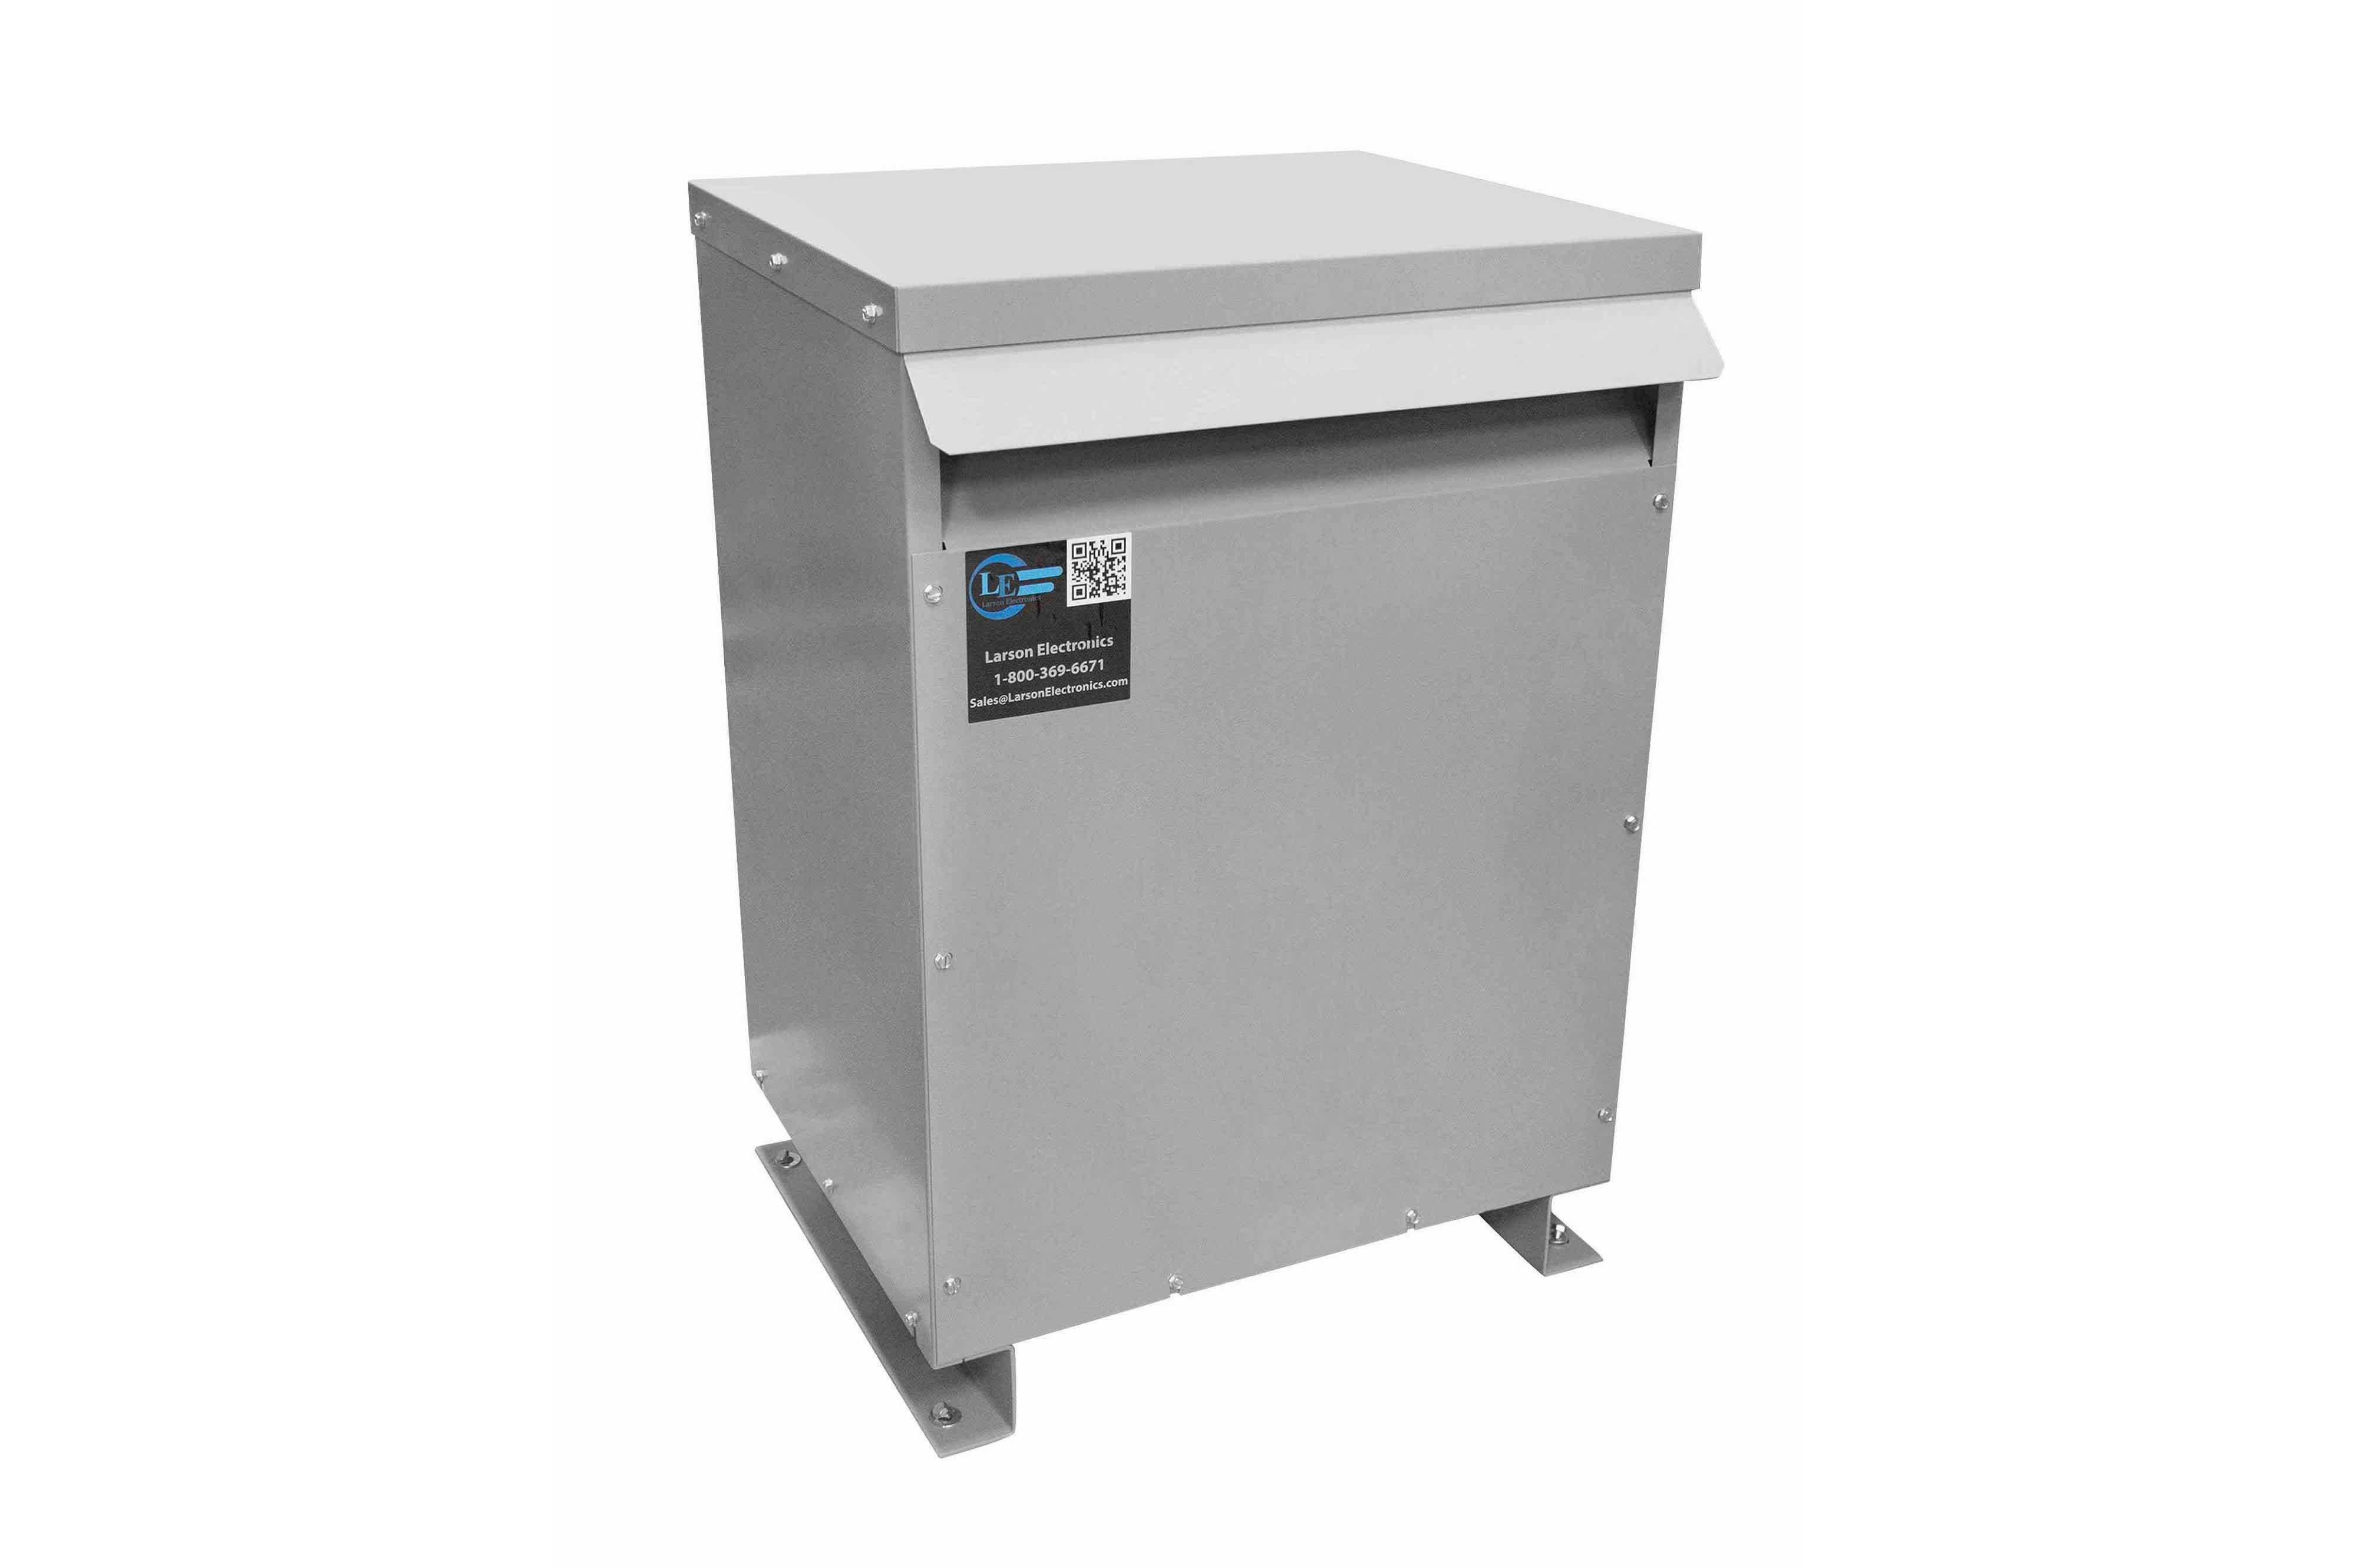 112.5 kVA 3PH DOE Transformer, 480V Delta Primary, 415Y/240 Wye-N Secondary, N3R, Ventilated, 60 Hz